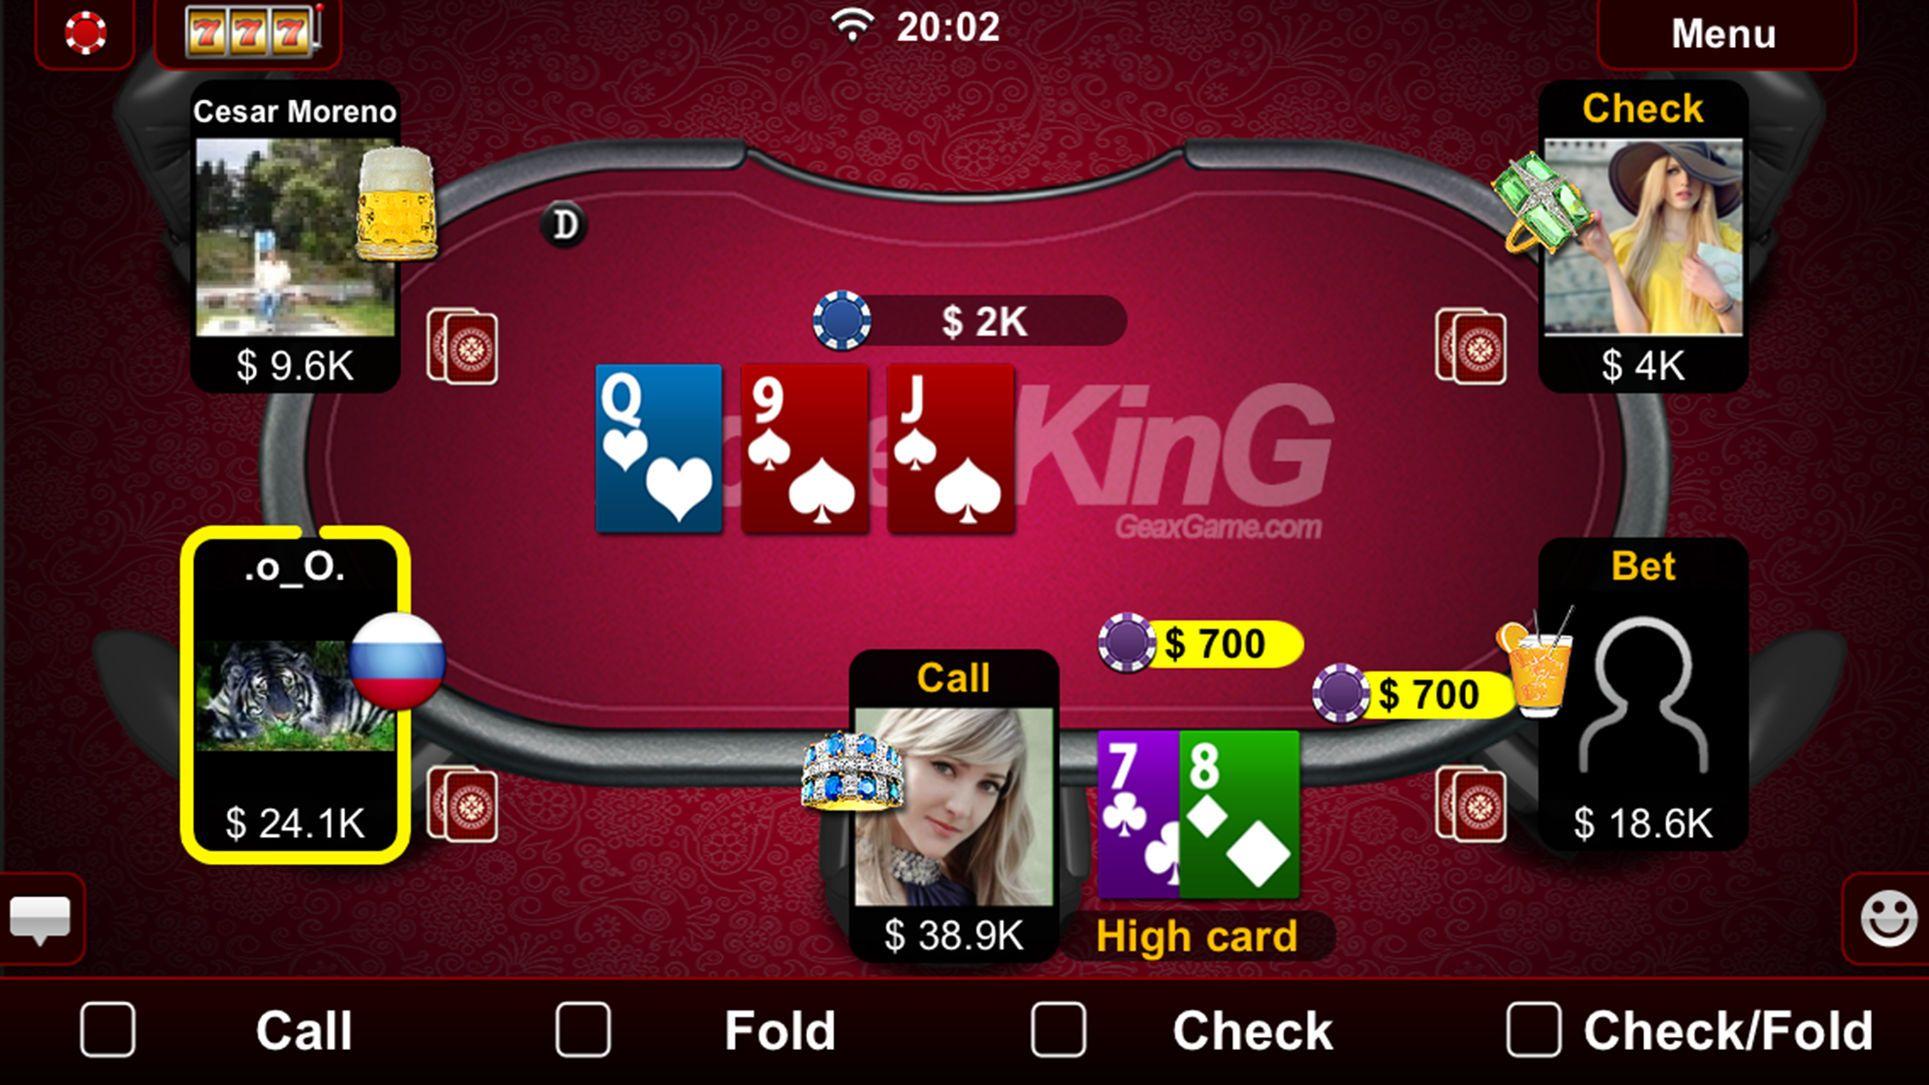 Live holdem poker casinocardiossports poker cards app